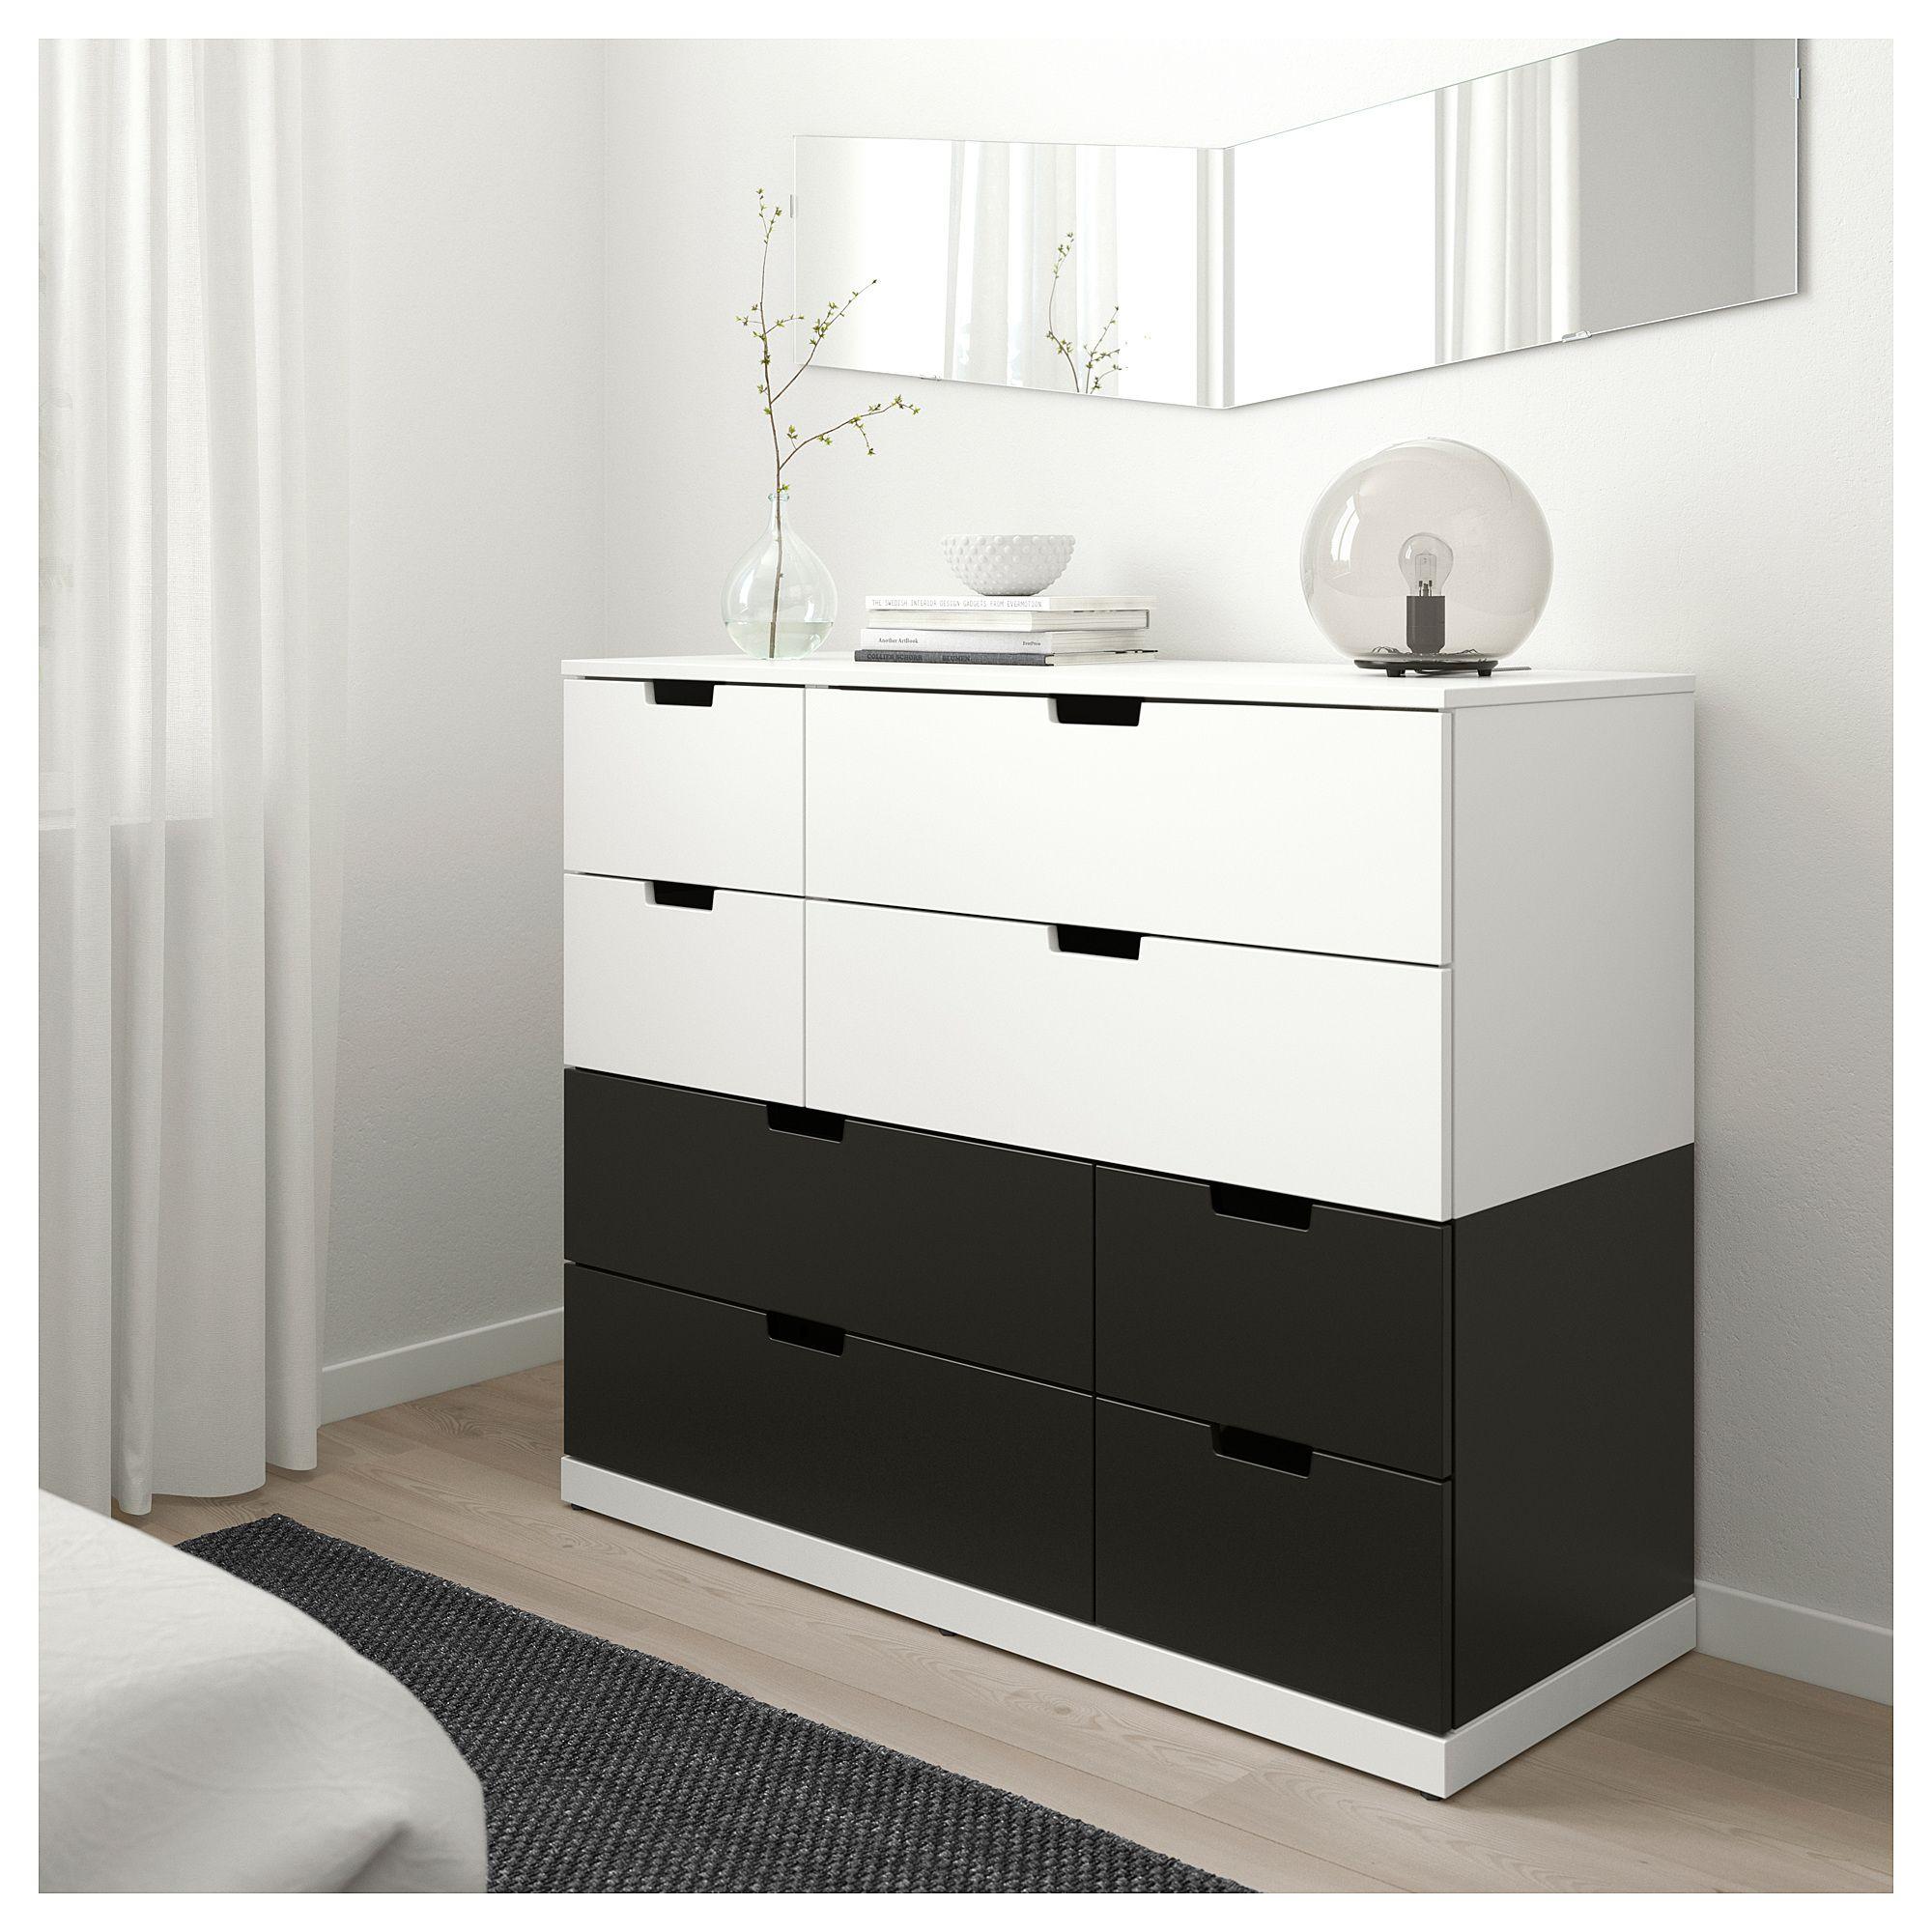 Nordli 8 Drawer Dresser White Anthracite 47 1 4x39 120x99 Cm